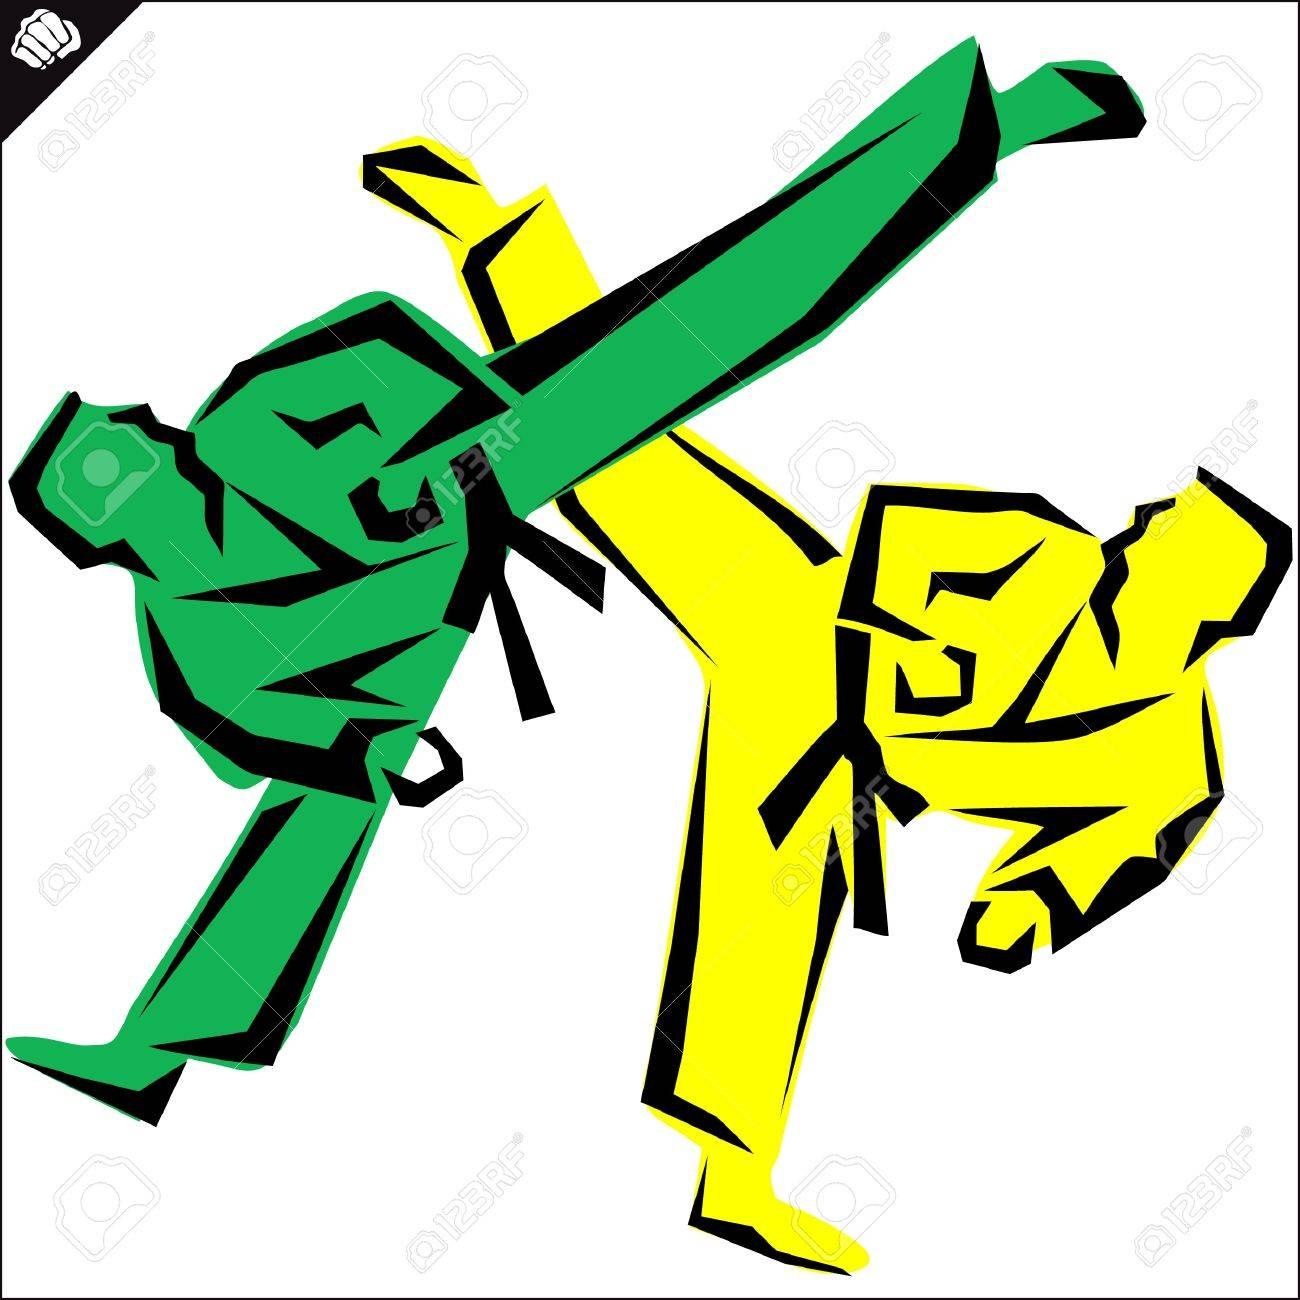 Chinese Martial Arts Symbols